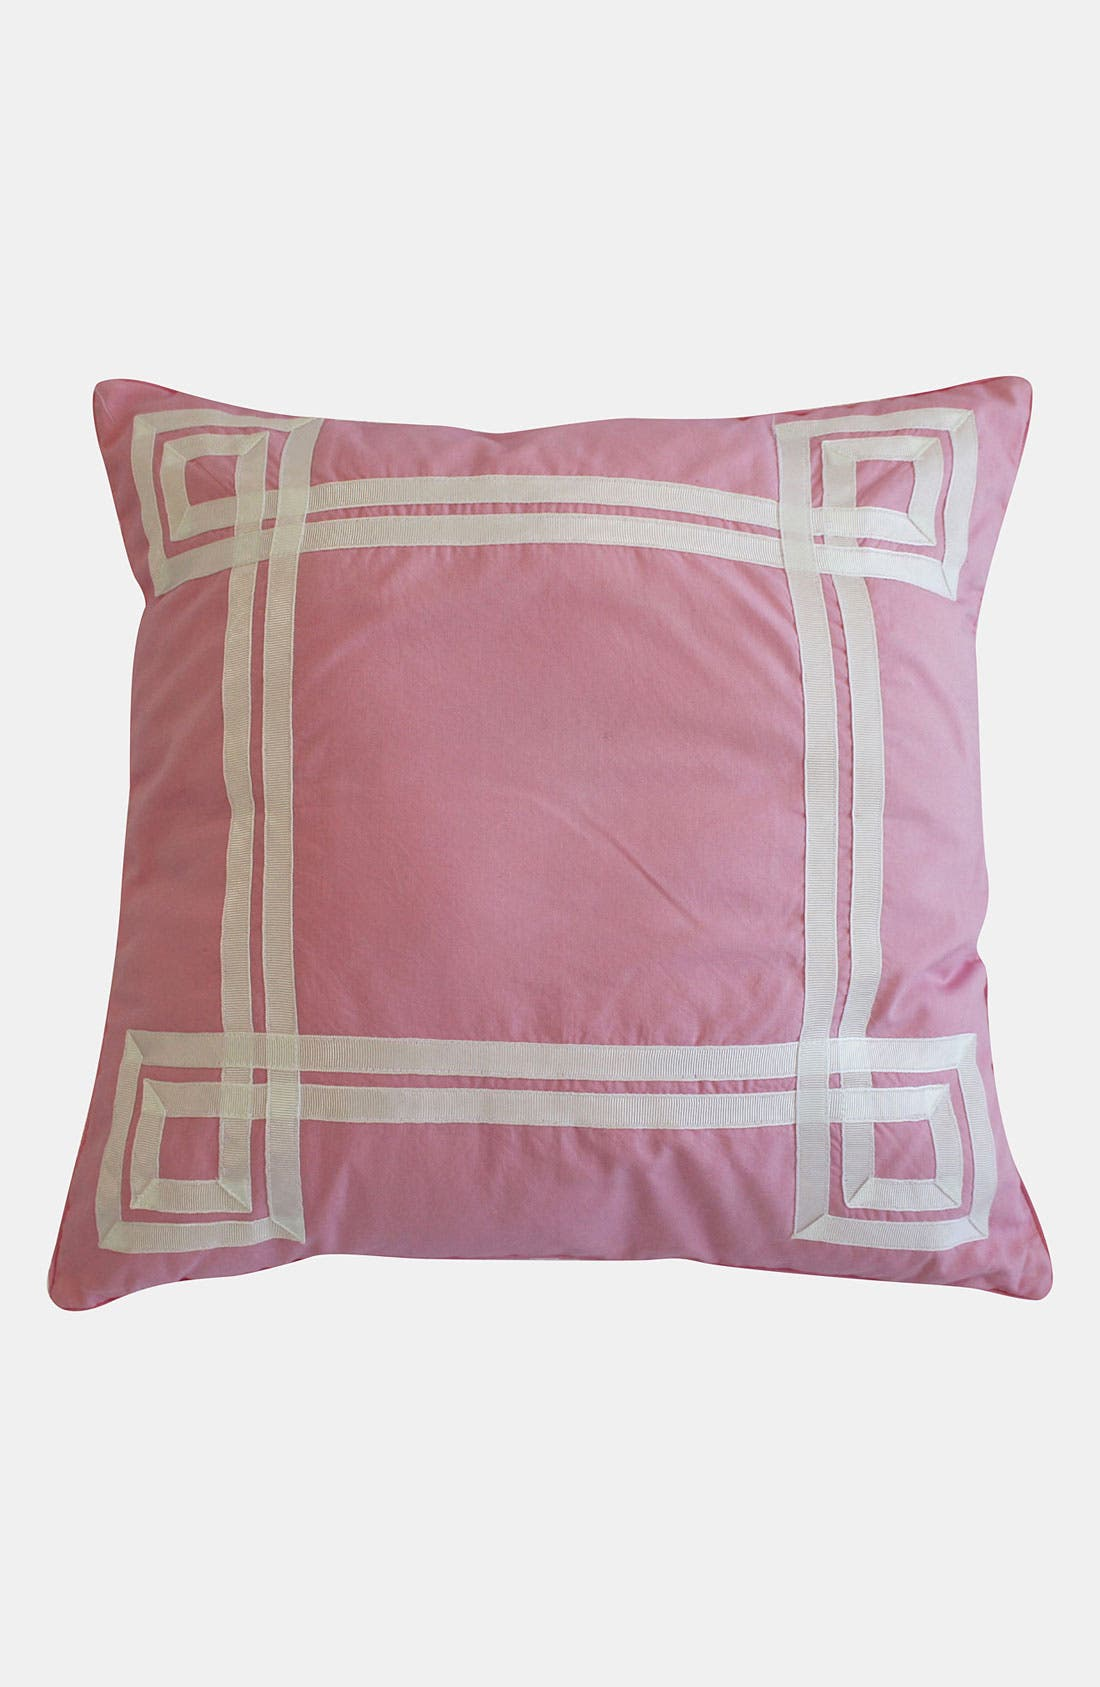 Alternate Image 1 Selected - Dena Home 'Annabelle' Pillow